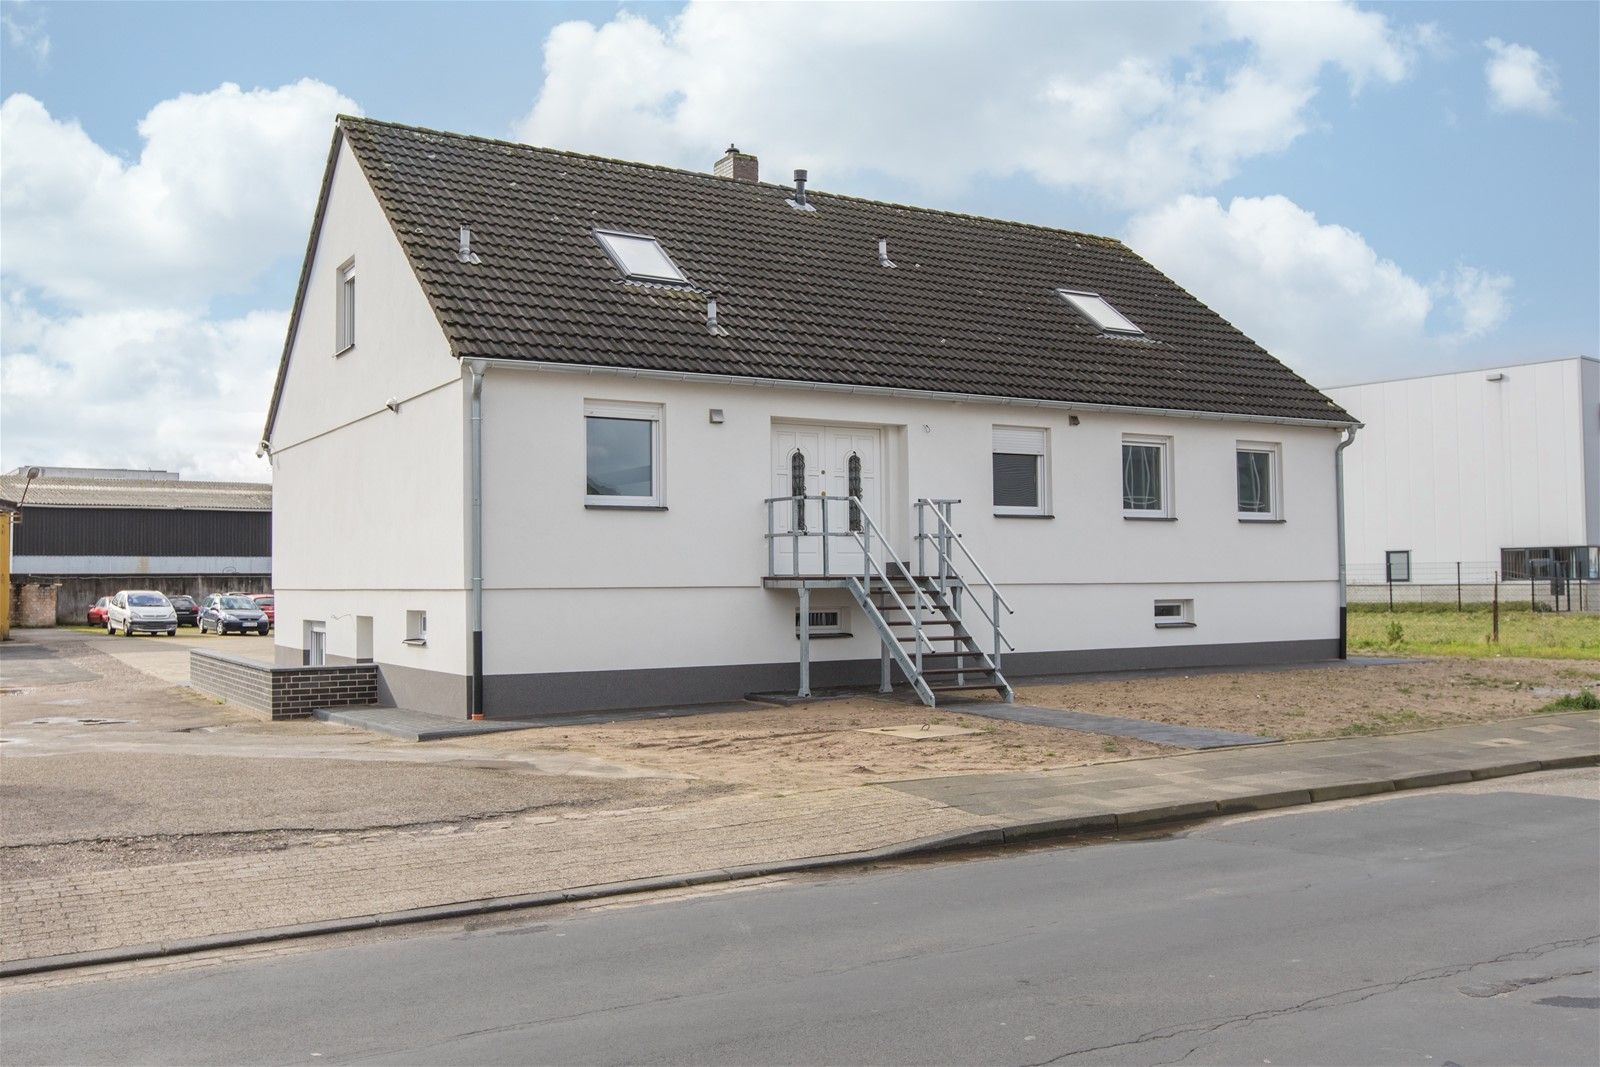 Duisburger Strasse 22 te Emmerich 0ong, 's-heerenberg